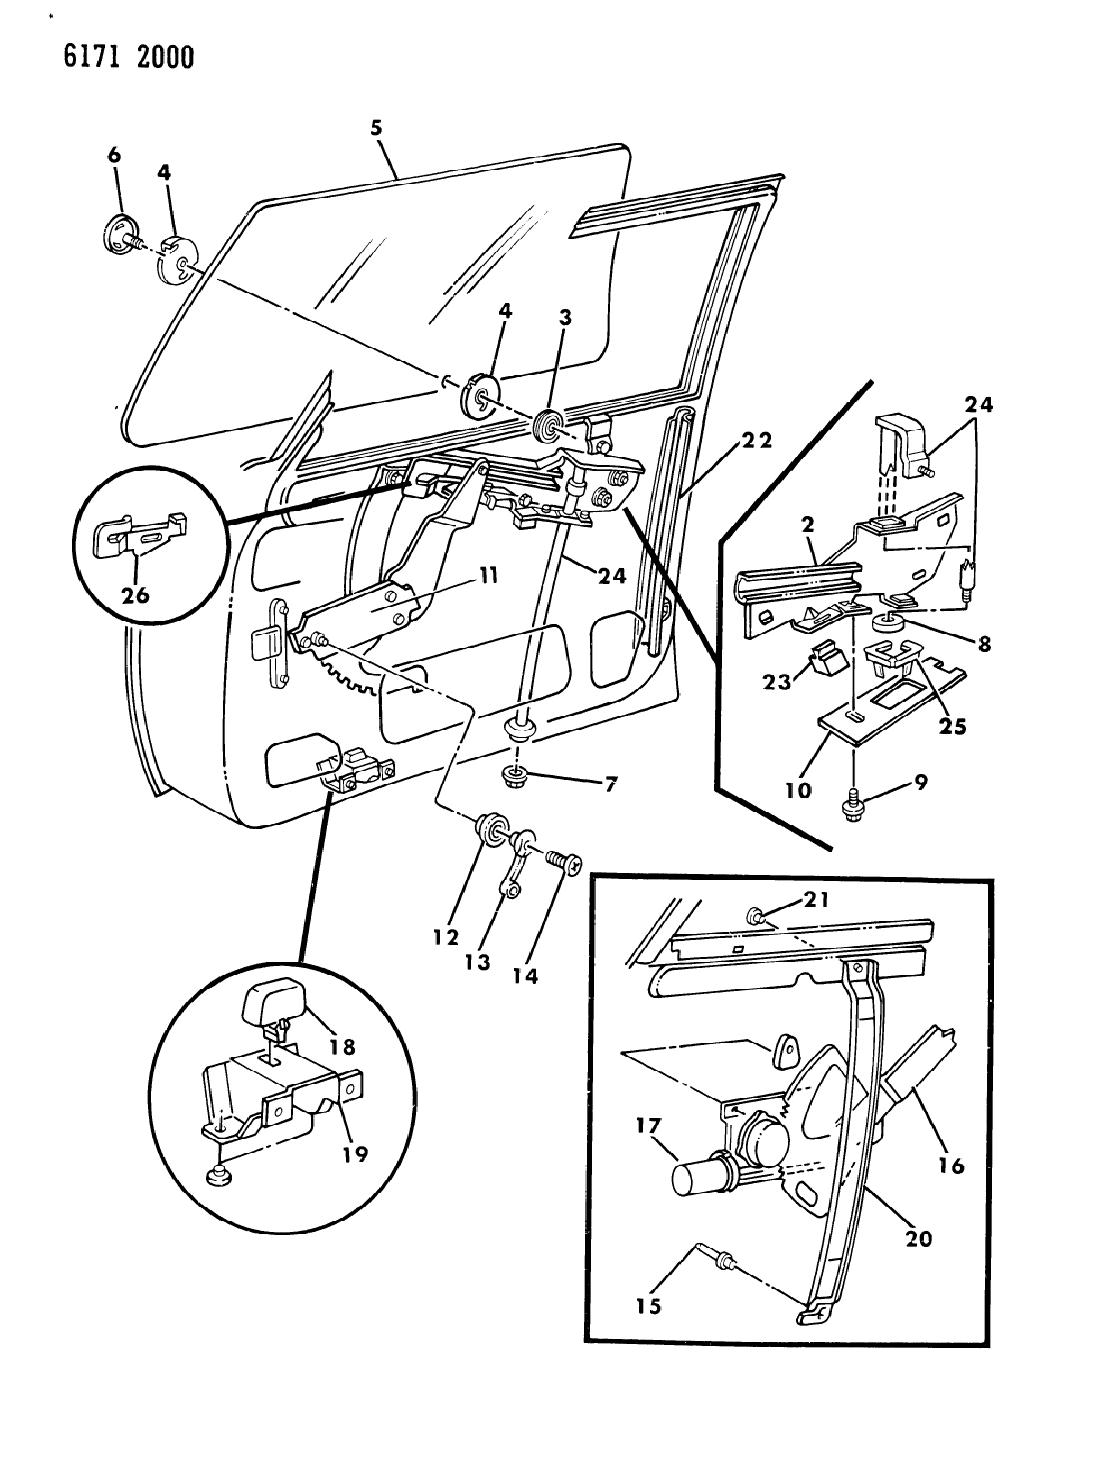 wiring diagram for 1986 chrysler lebaron base door, front gl &  regulator on tires for a,